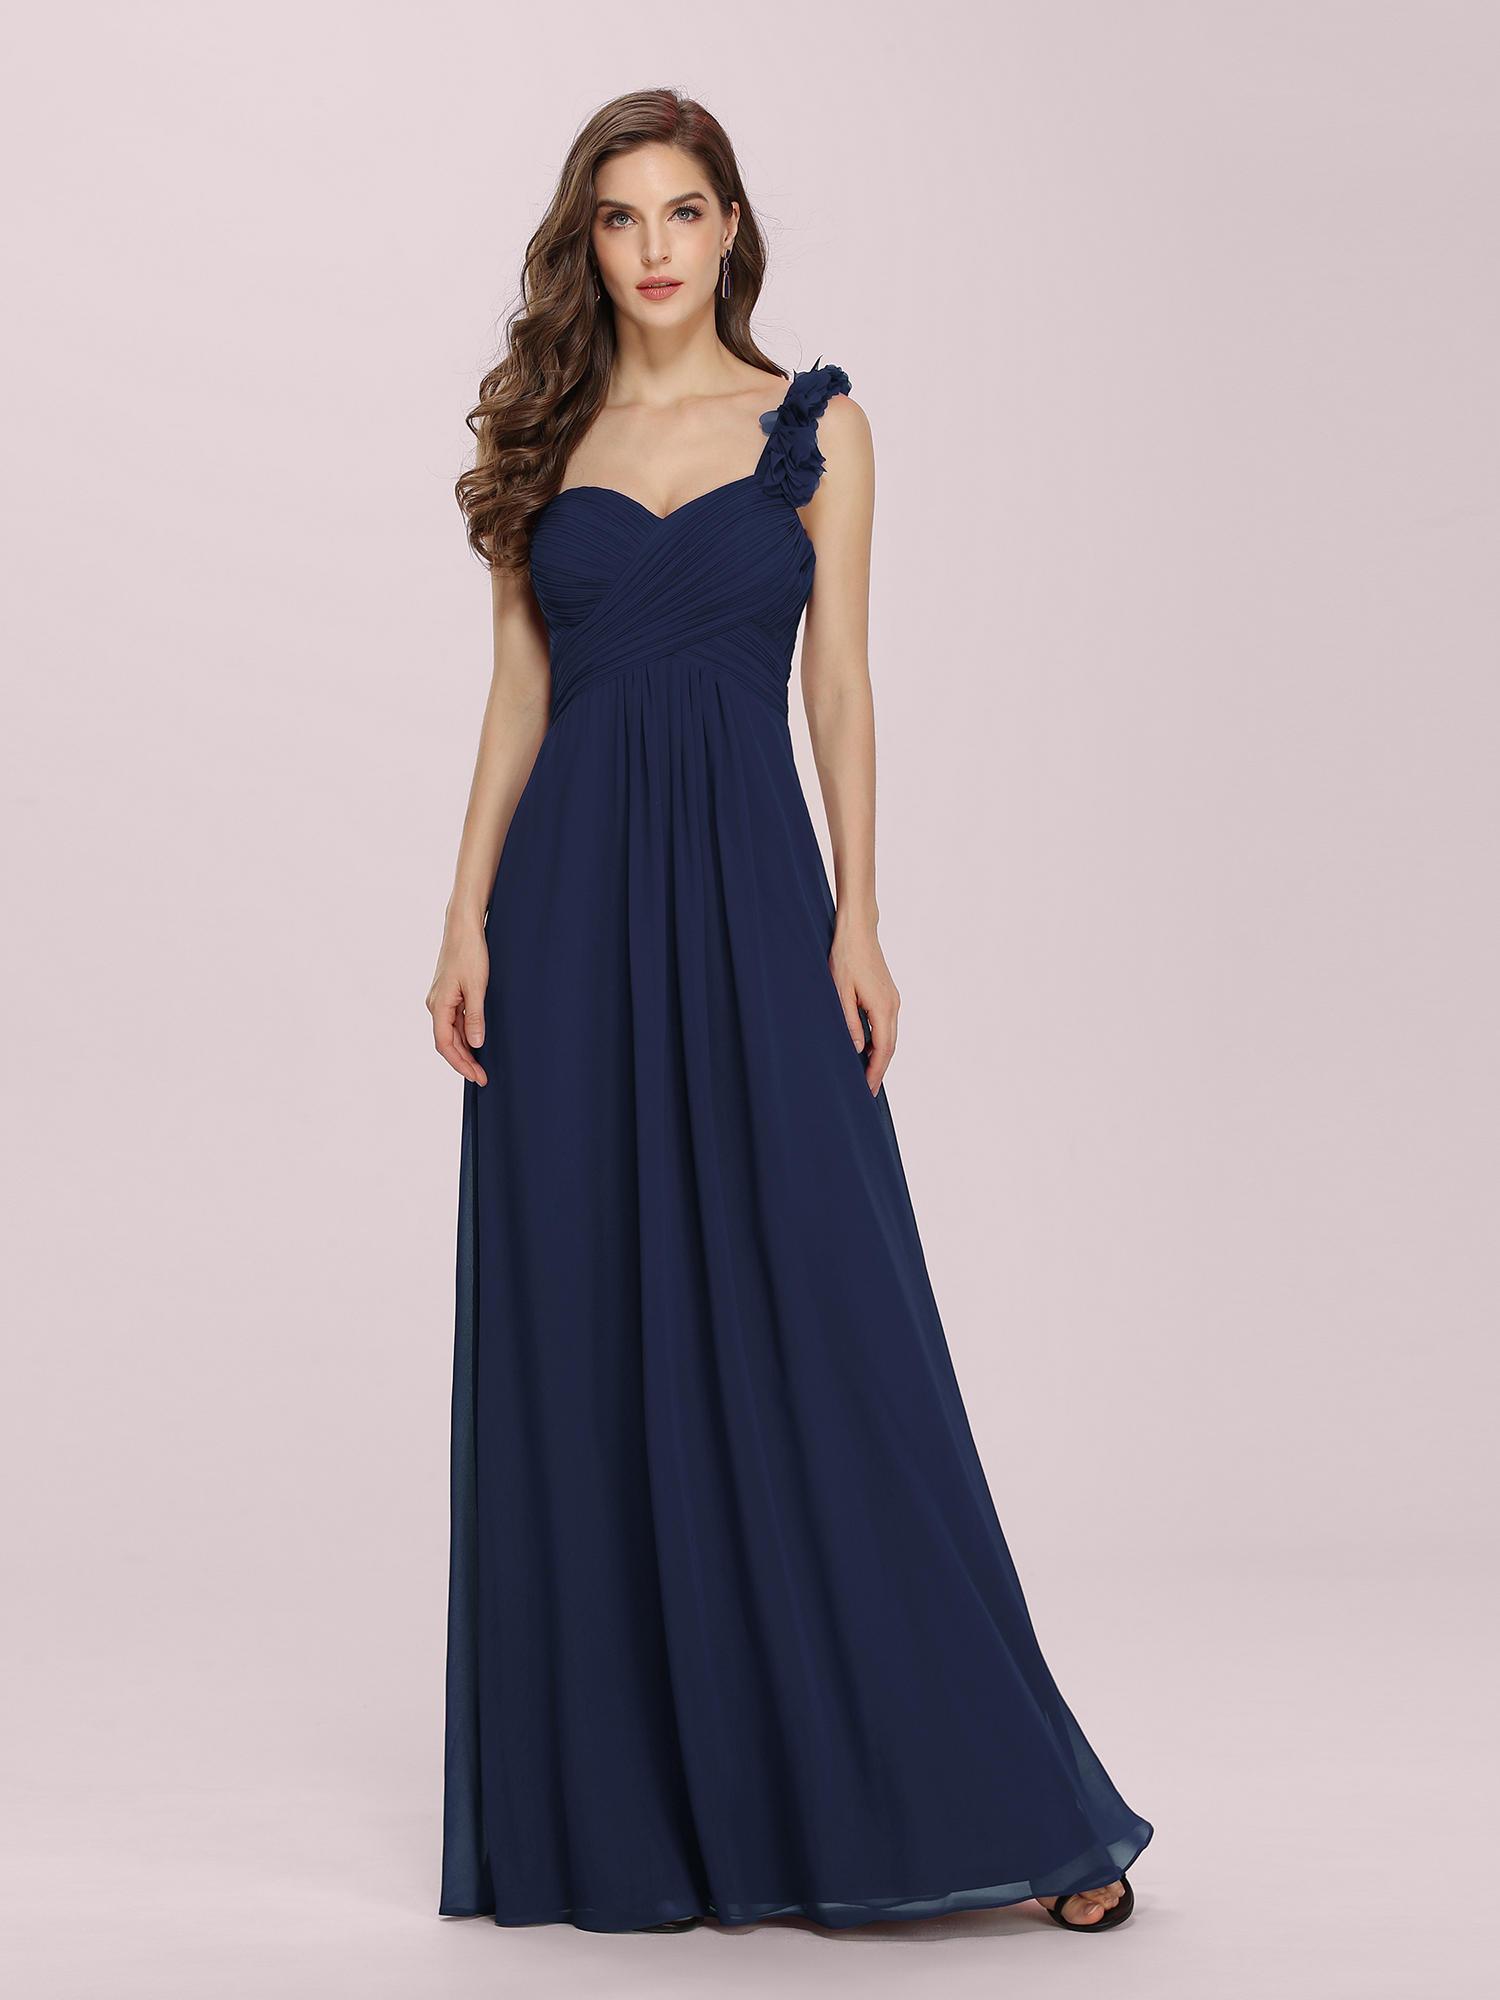 Ever-Pretty US Long Bridesmaid Dresses One-shoulder Navy Blue Formal ...